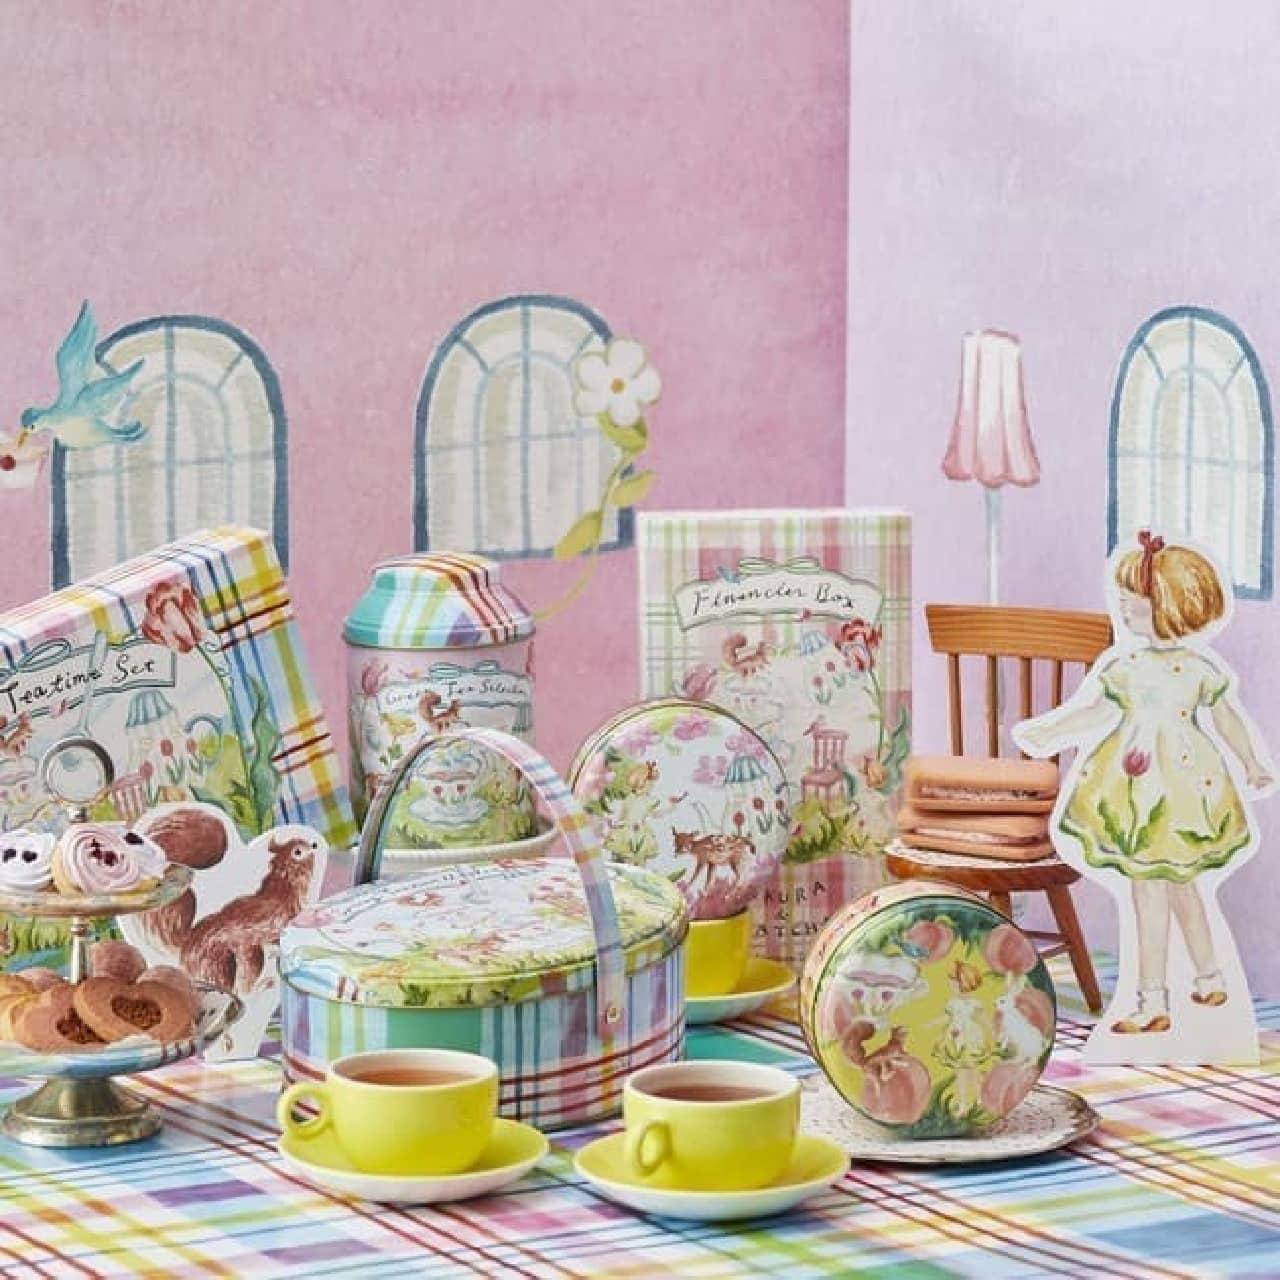 Afternoon Teaから春のお茶&お菓子セット -- トートバッグのプレゼント企画も